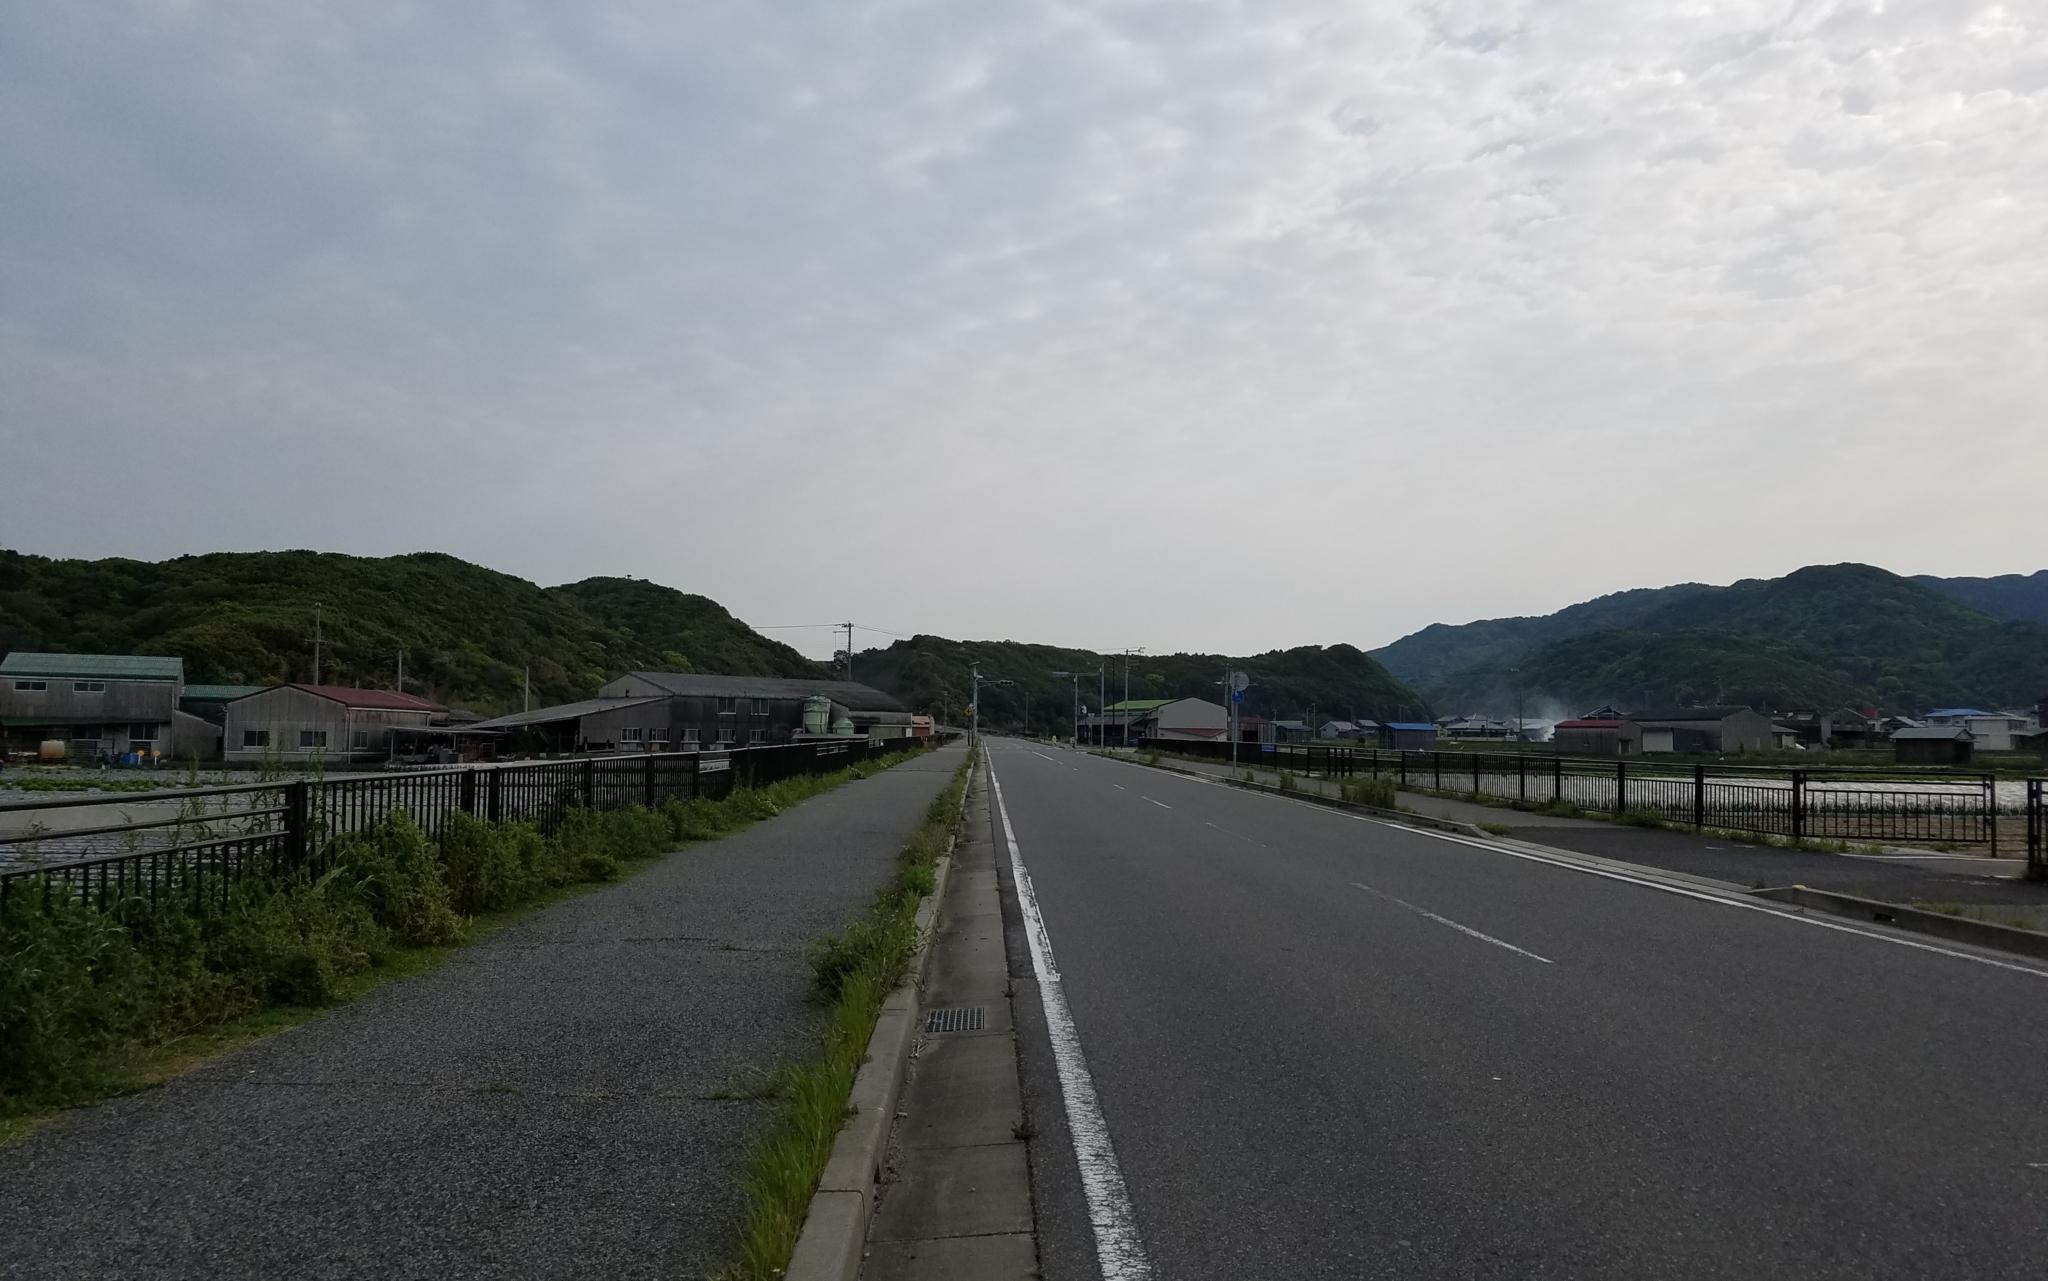 f:id:ToshUeno:20170429072446j:plain